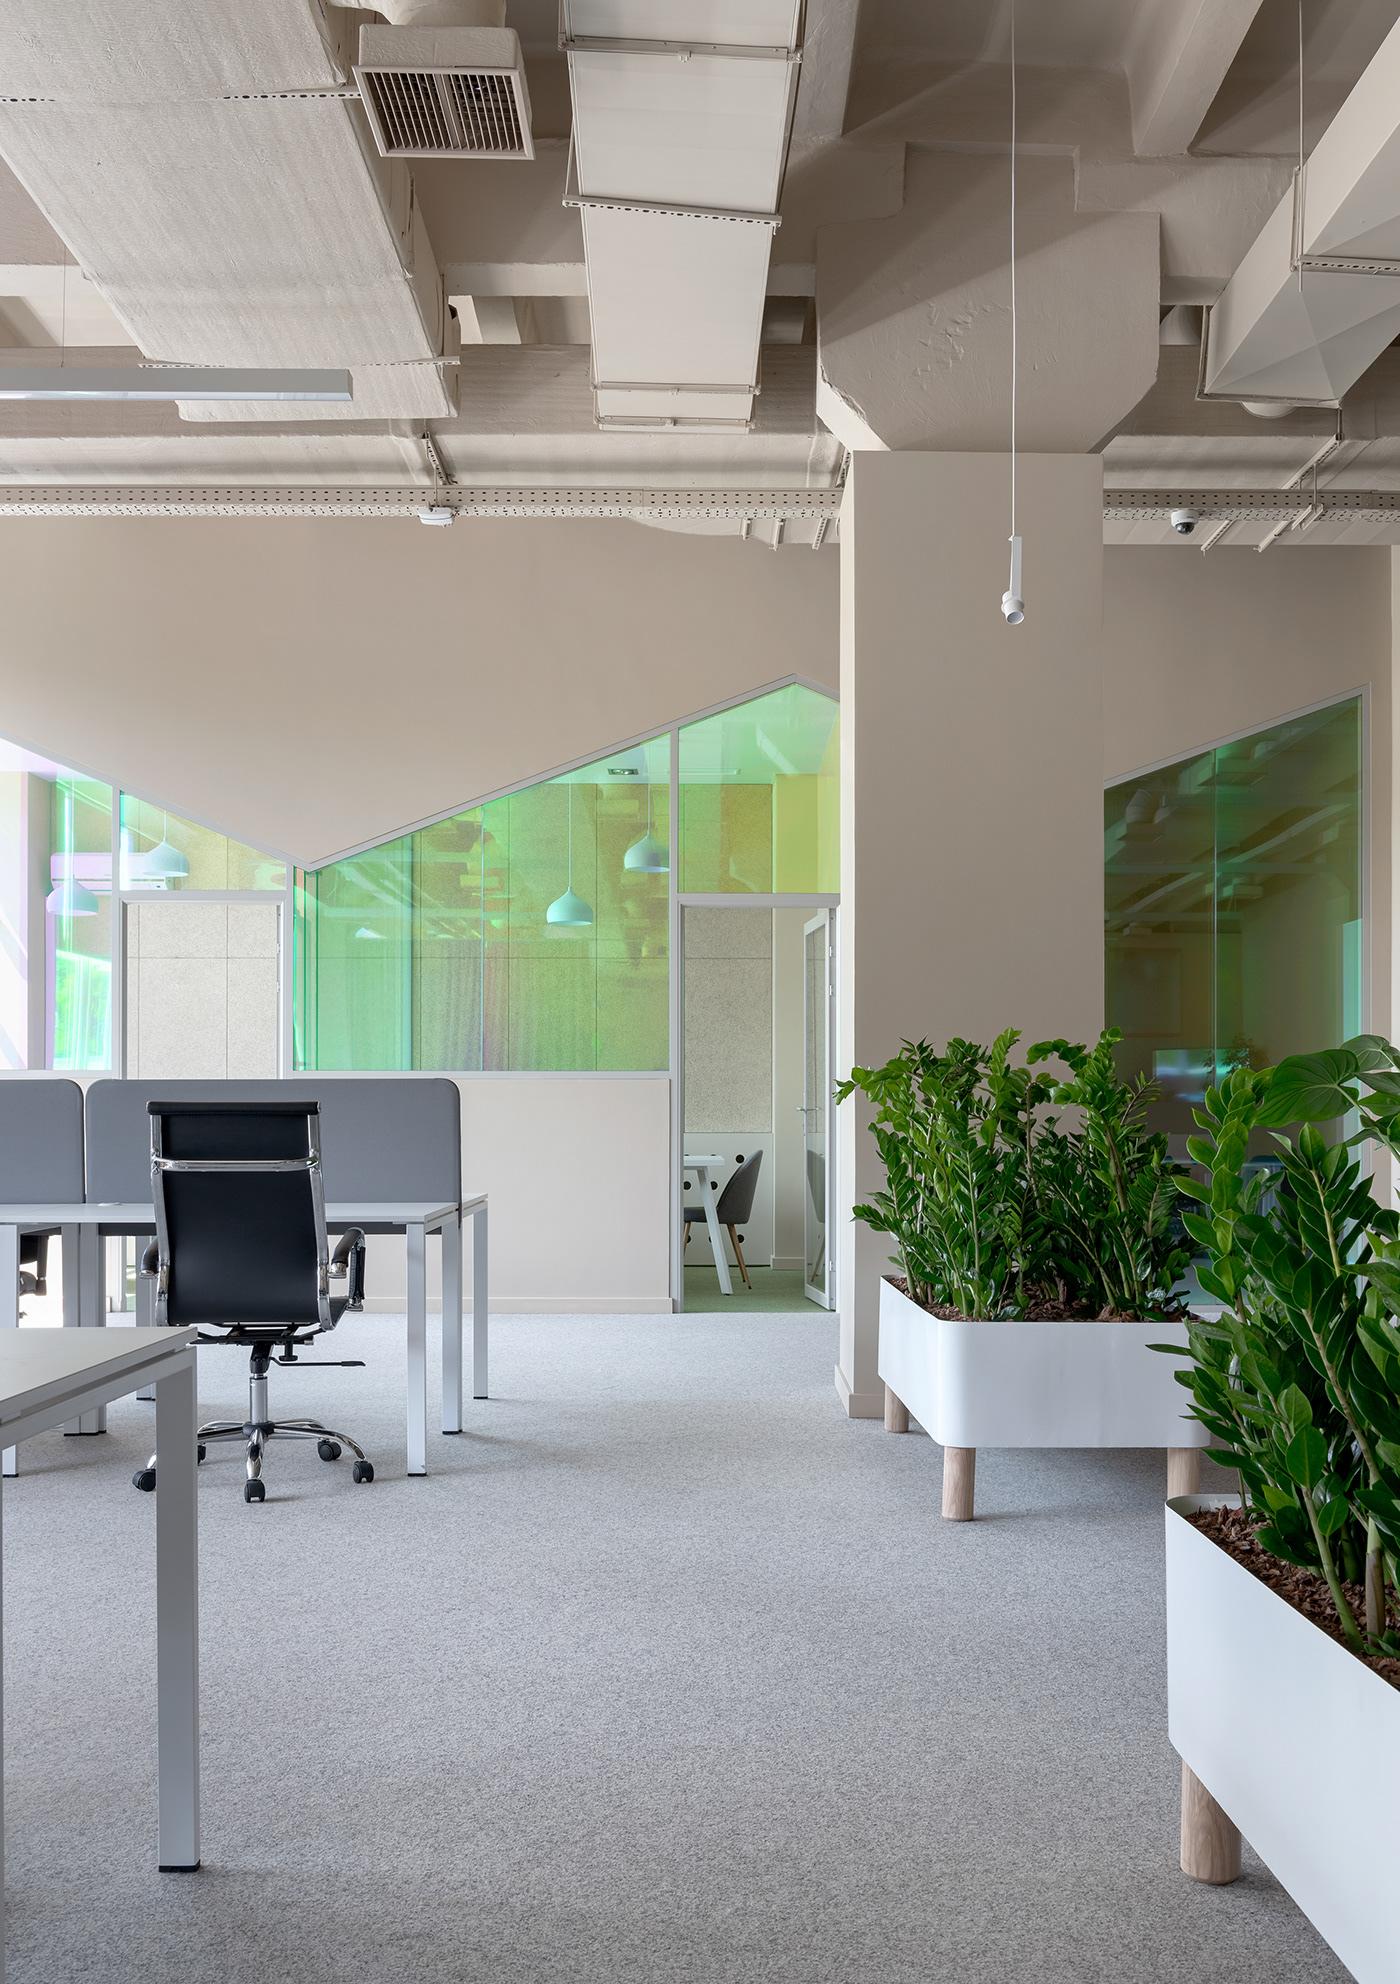 Office Office interior Office Design interior design  dichroic modern office Interior